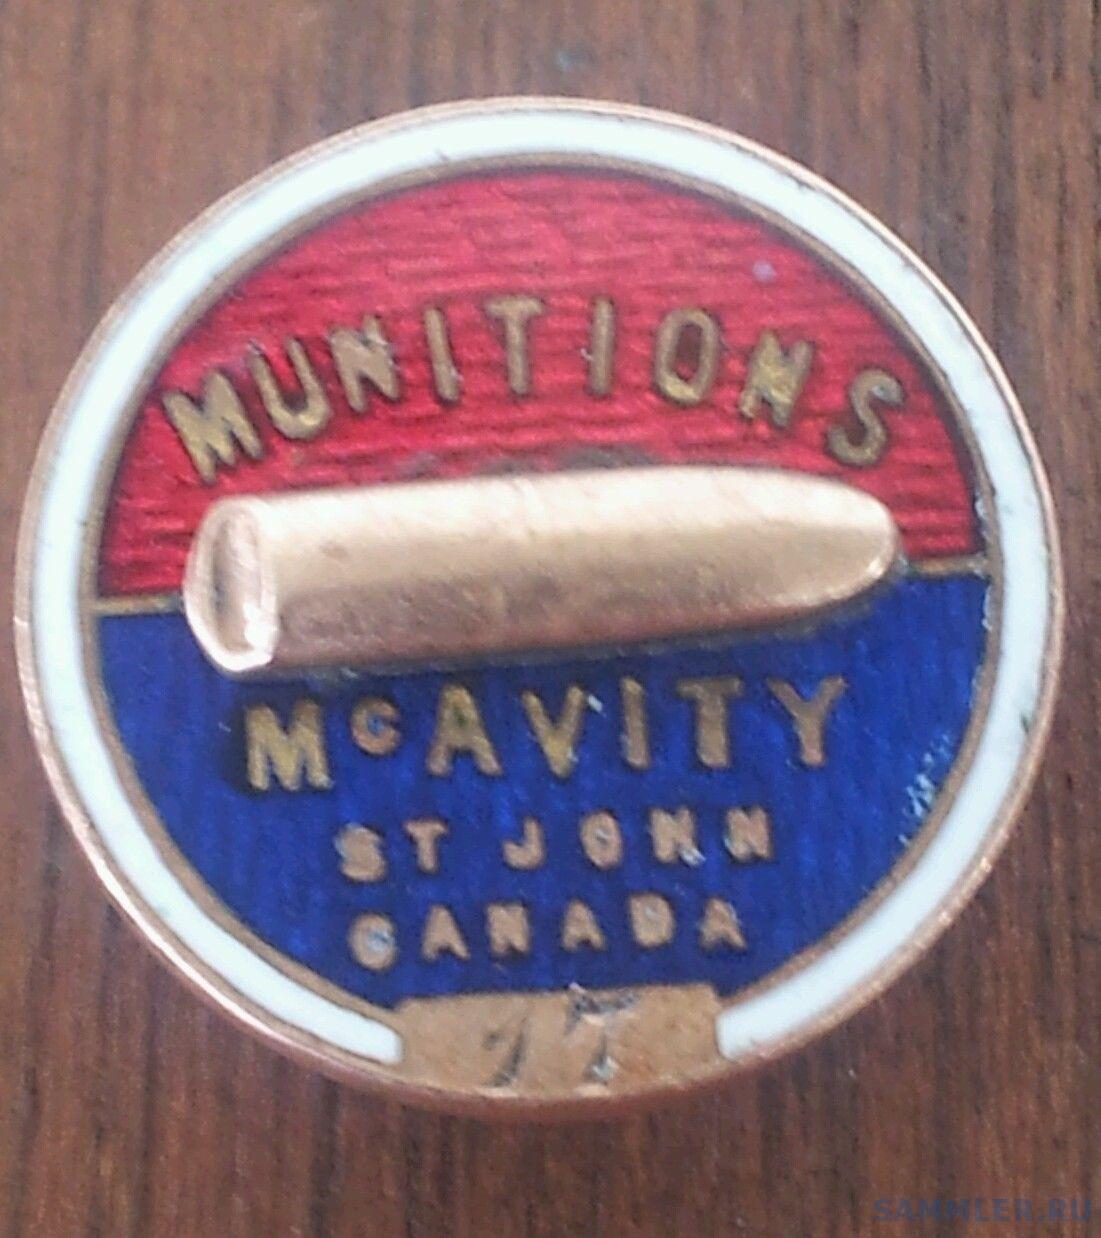 McAvity Munitions St Johns Canada.jpg